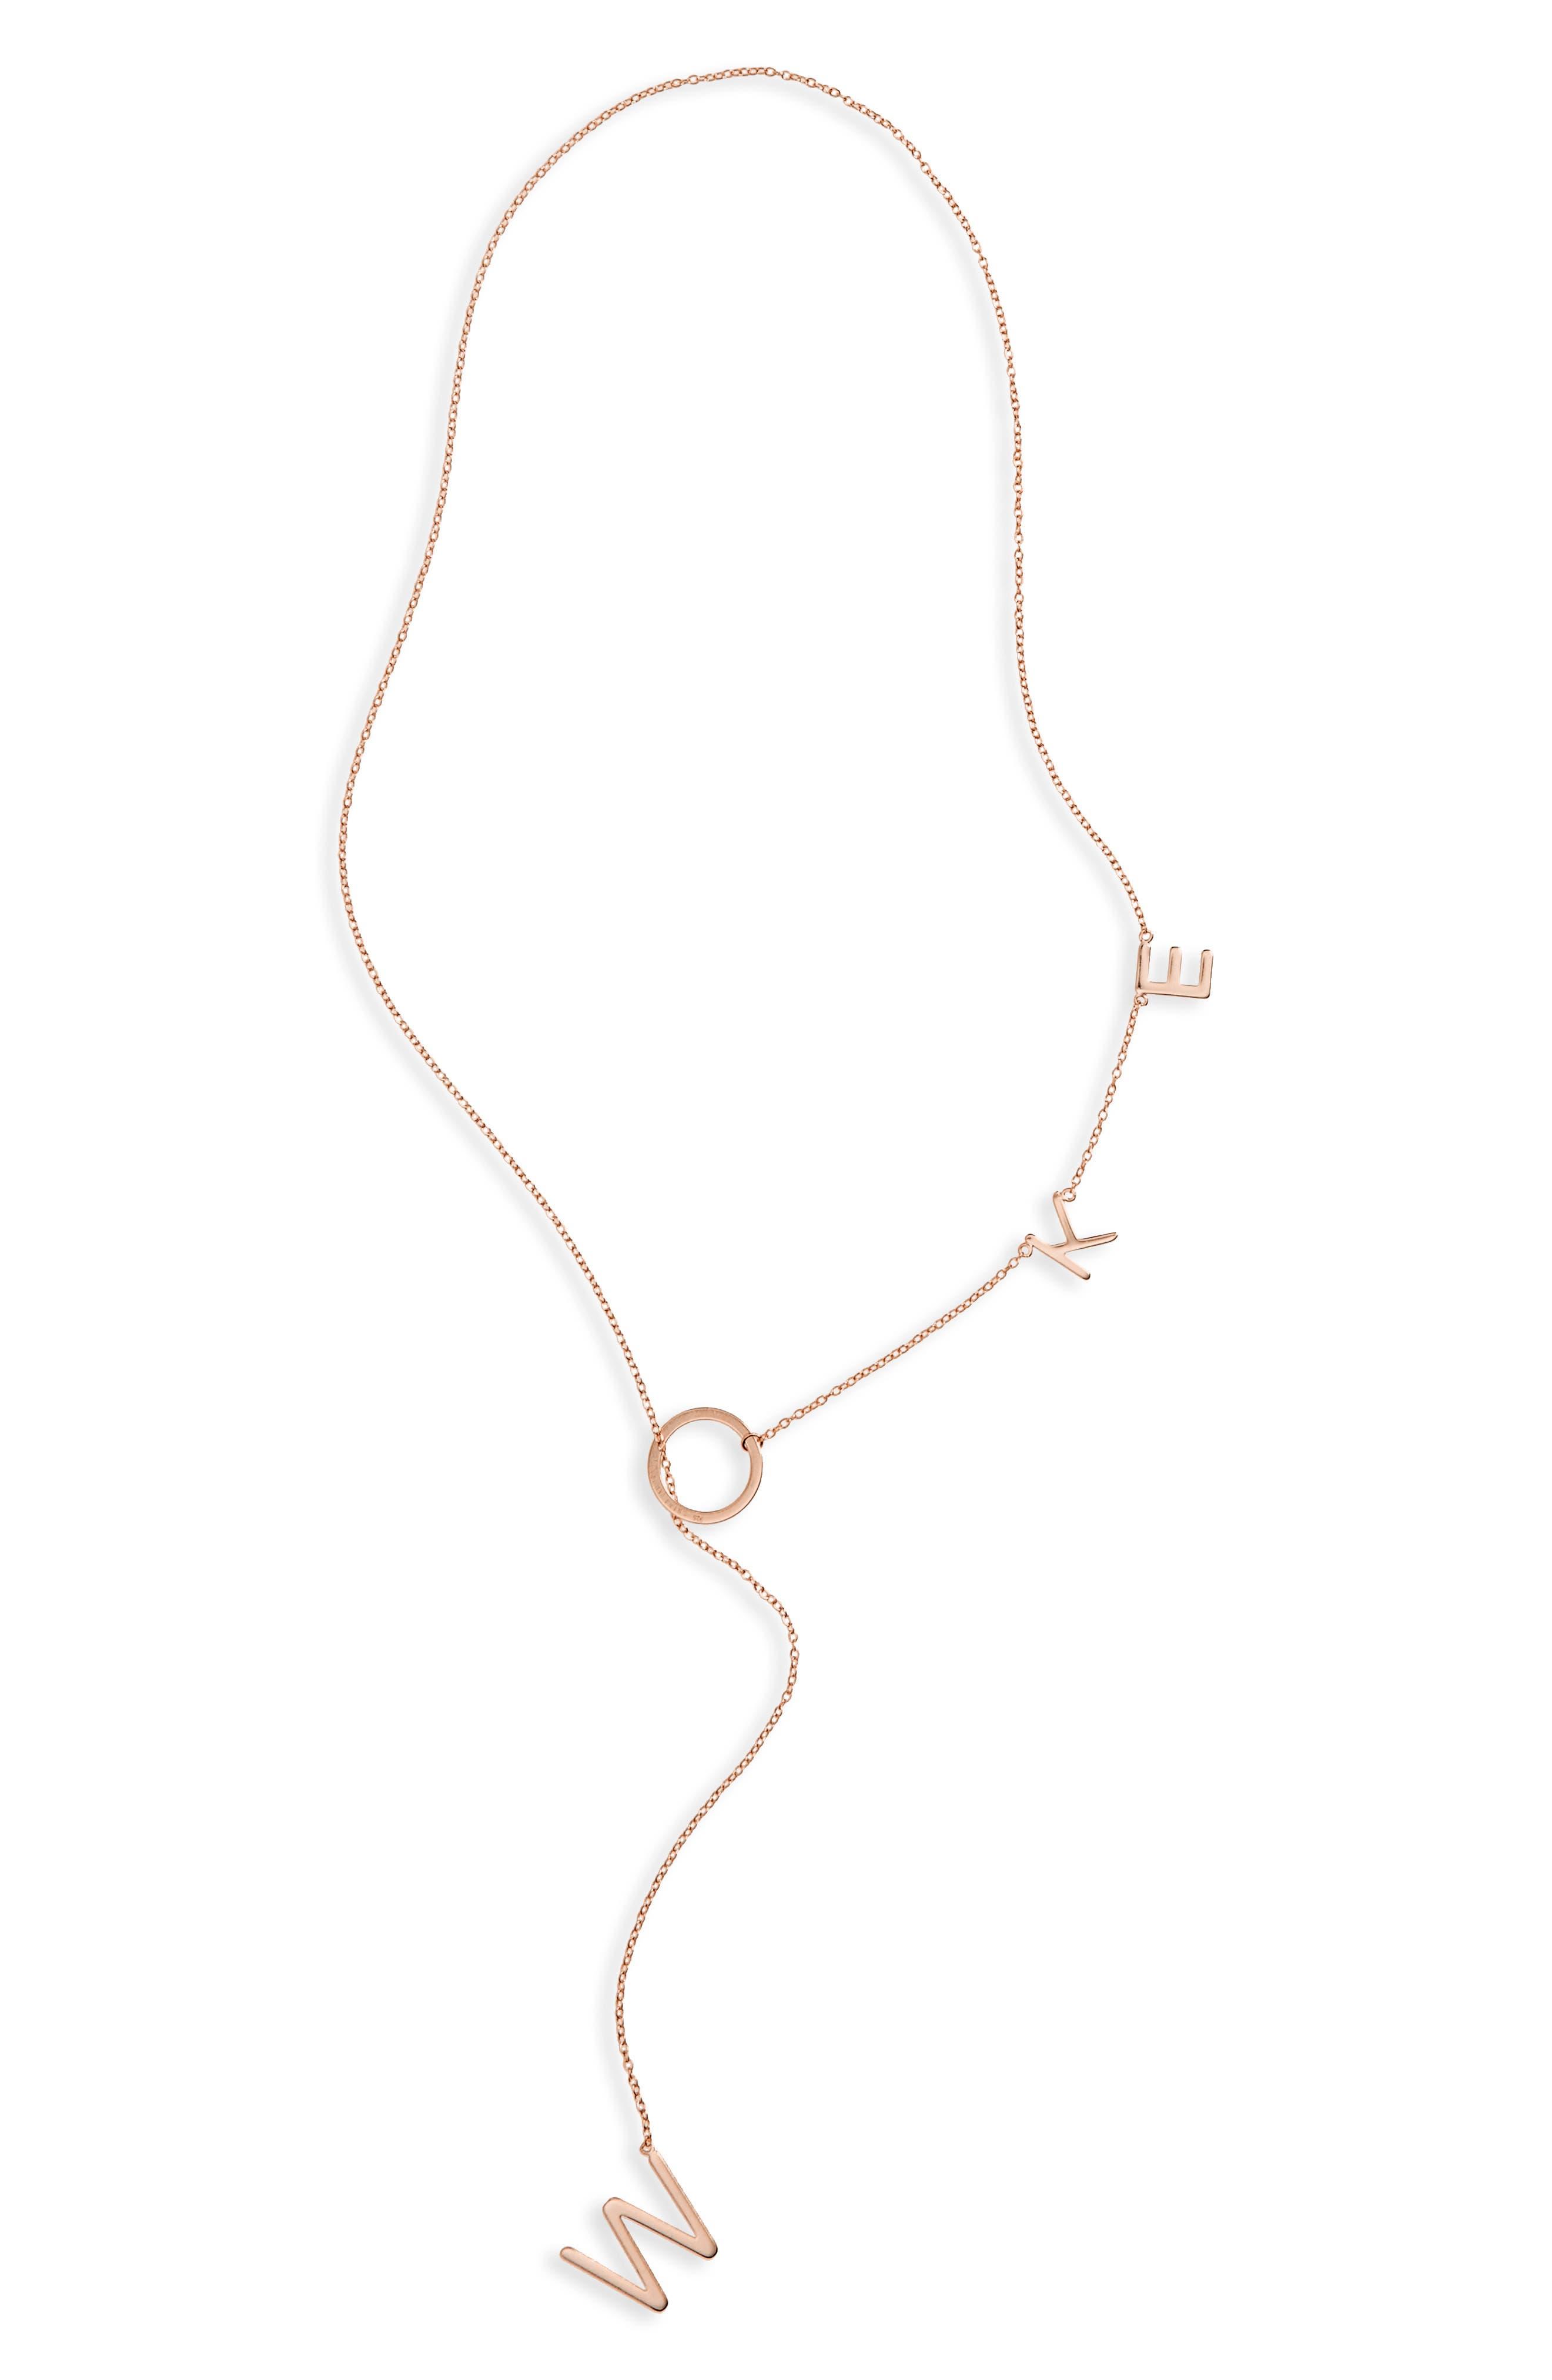 Adornia Woke Lariat Necklace